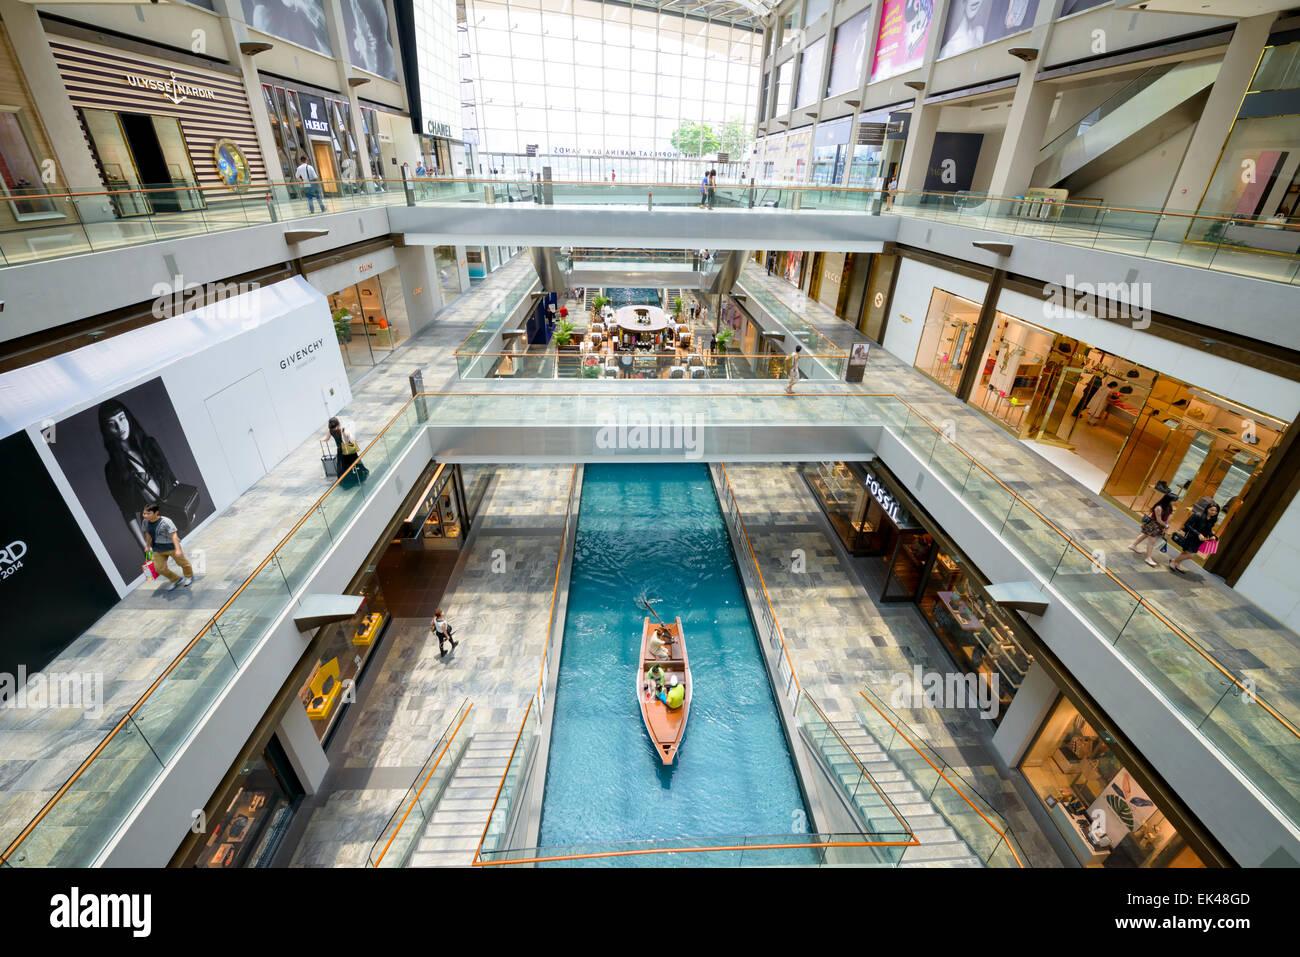 The impressive, huge new 'The Shoppes' at Marina Bay Sands, Singapore - interior of large, modern shopping - Stock Image